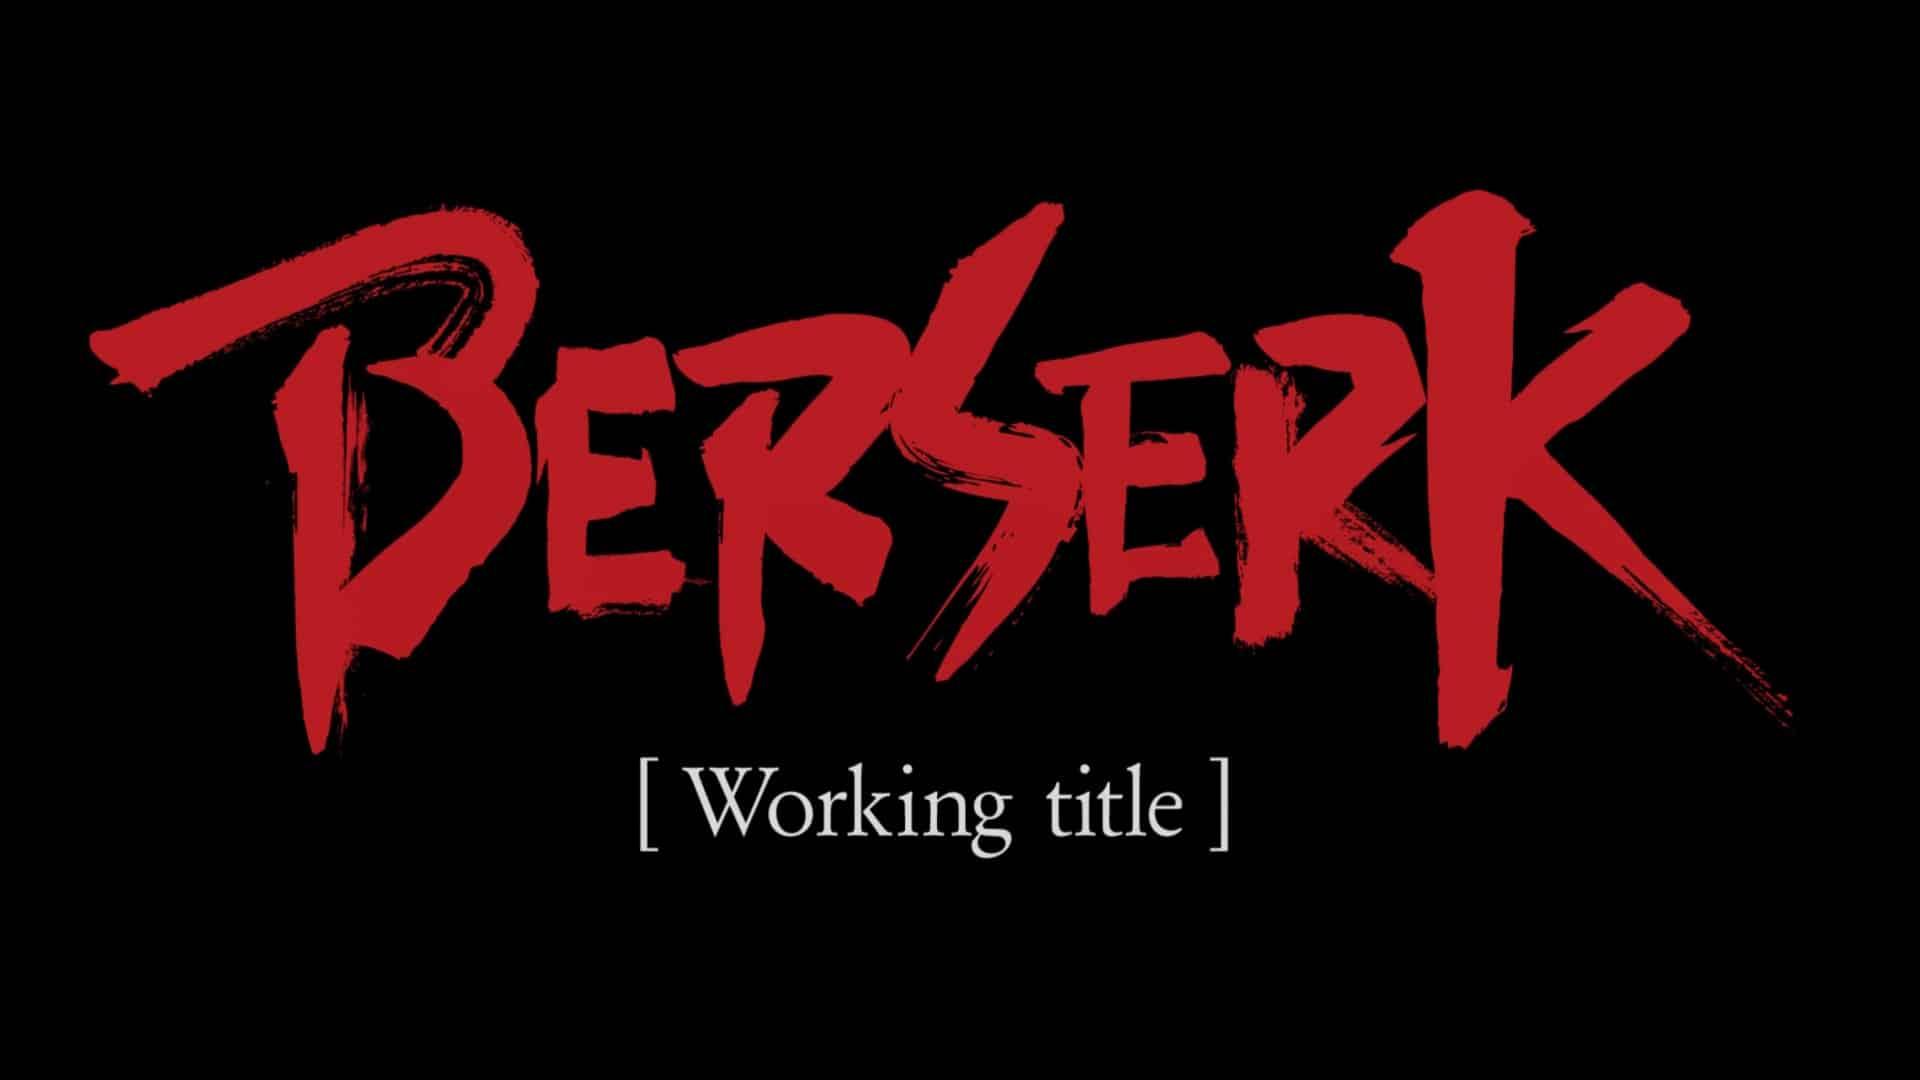 Berserk, rilasciato un nuovo video gameplay